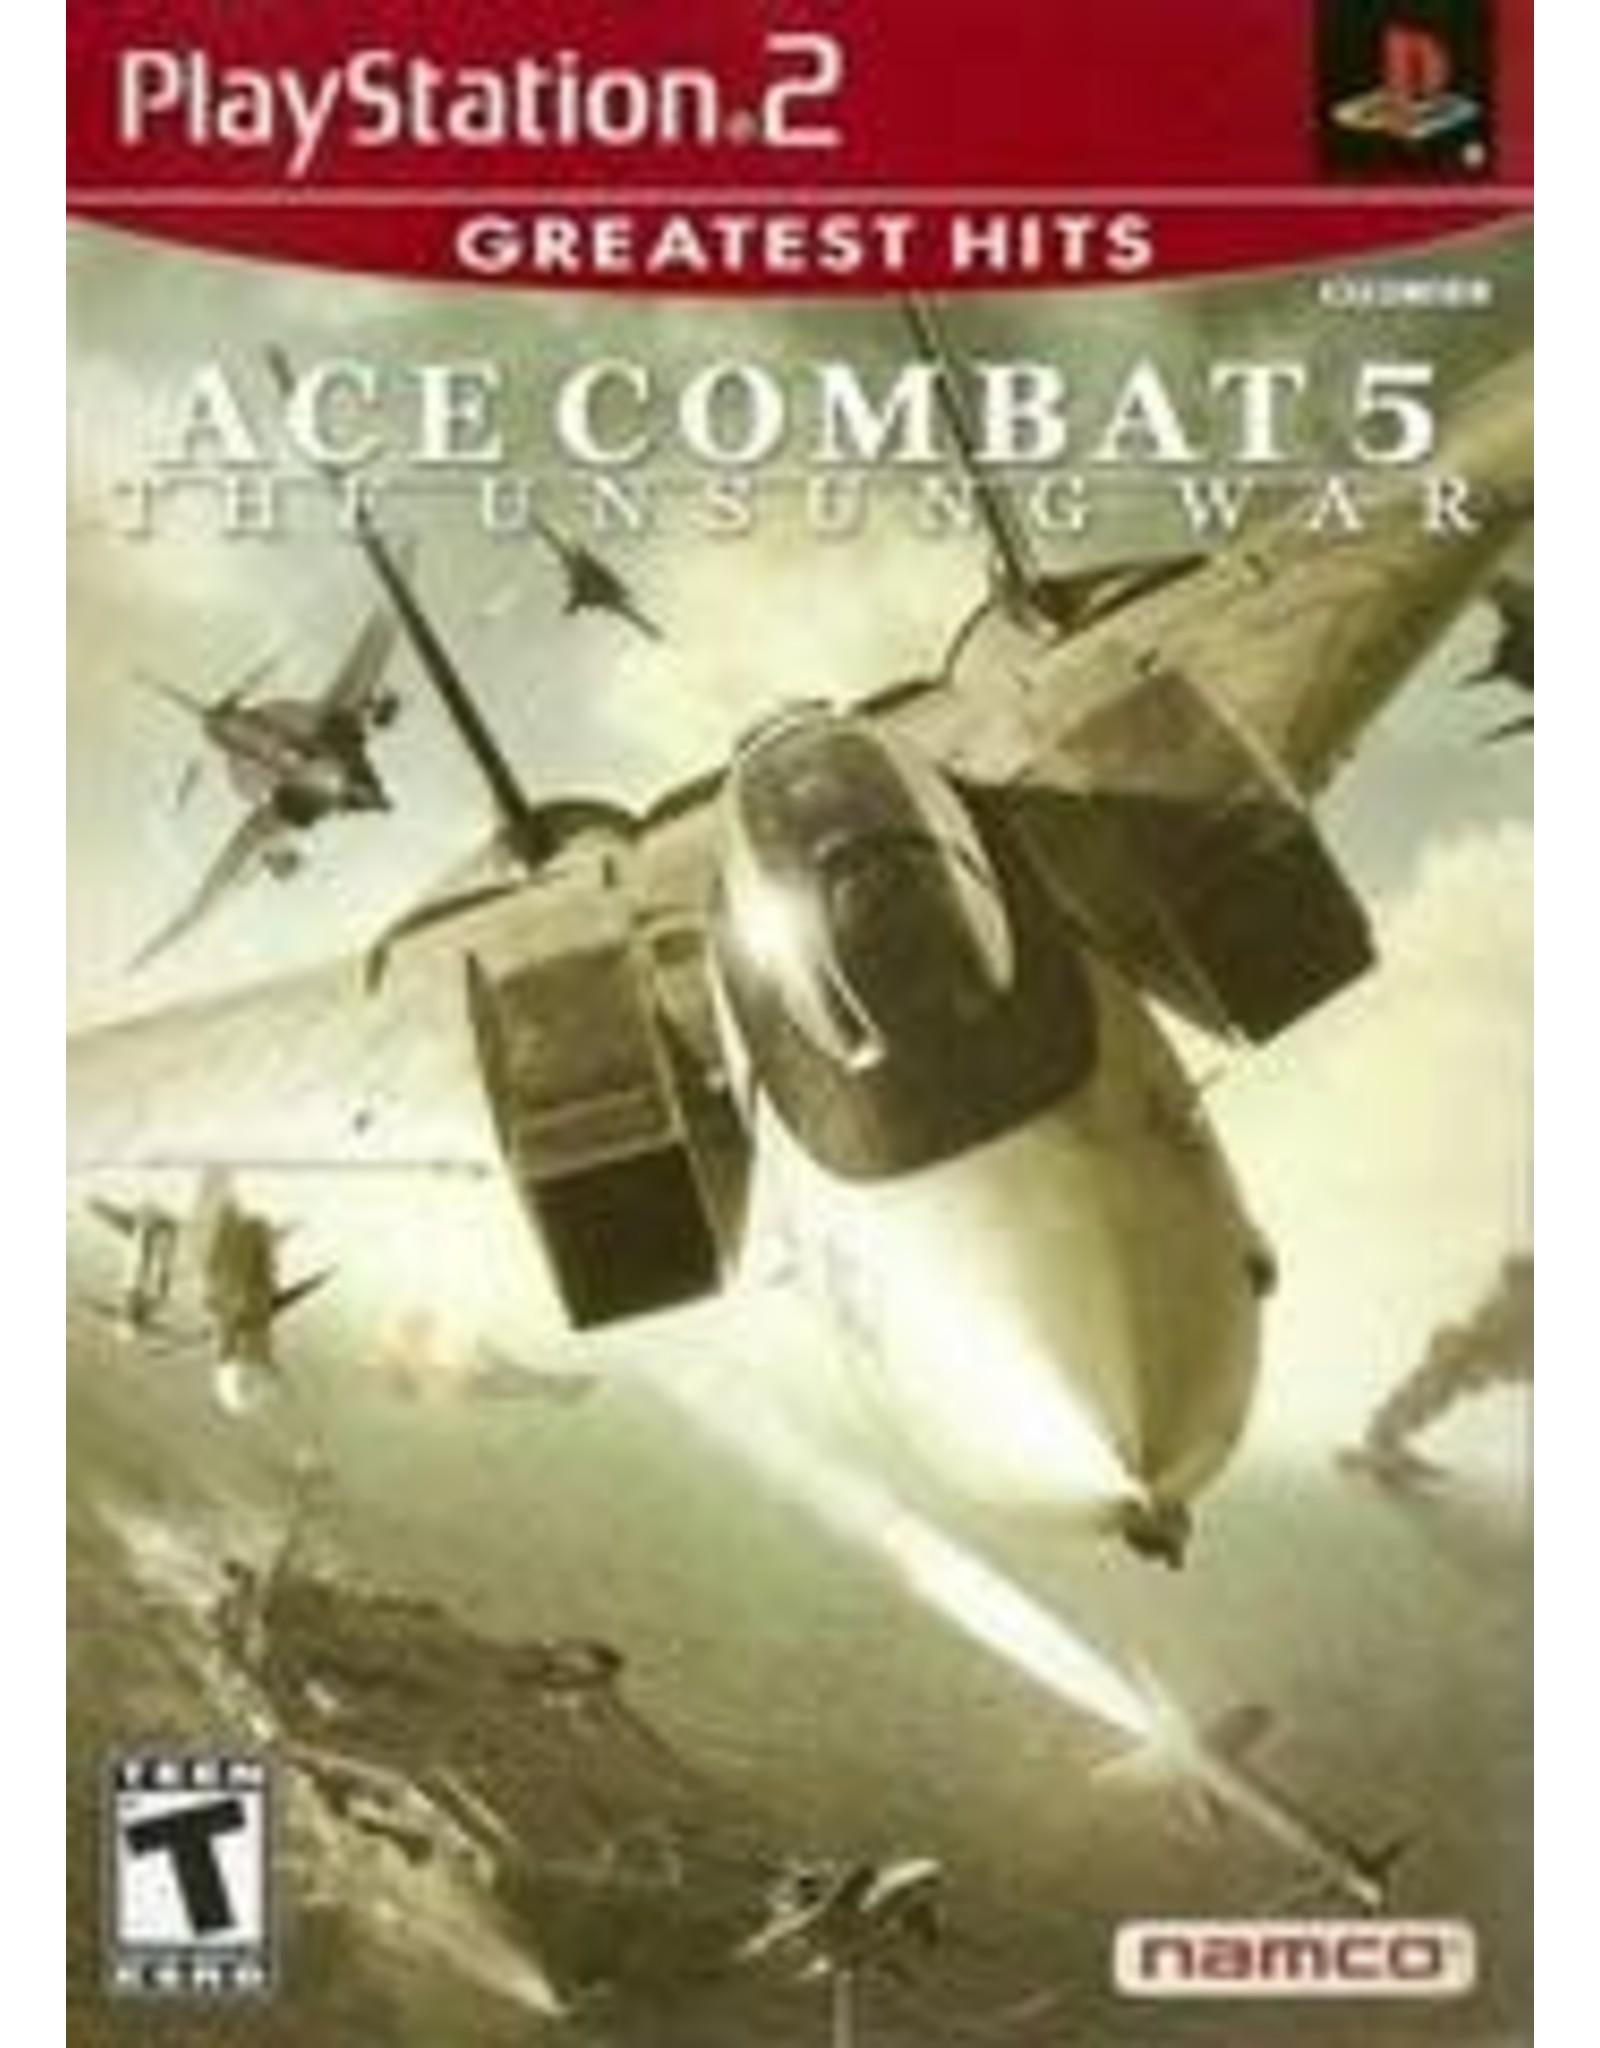 Playstation 2 Ace Combat 5 Unsung War (Greatest Hits, CiB)